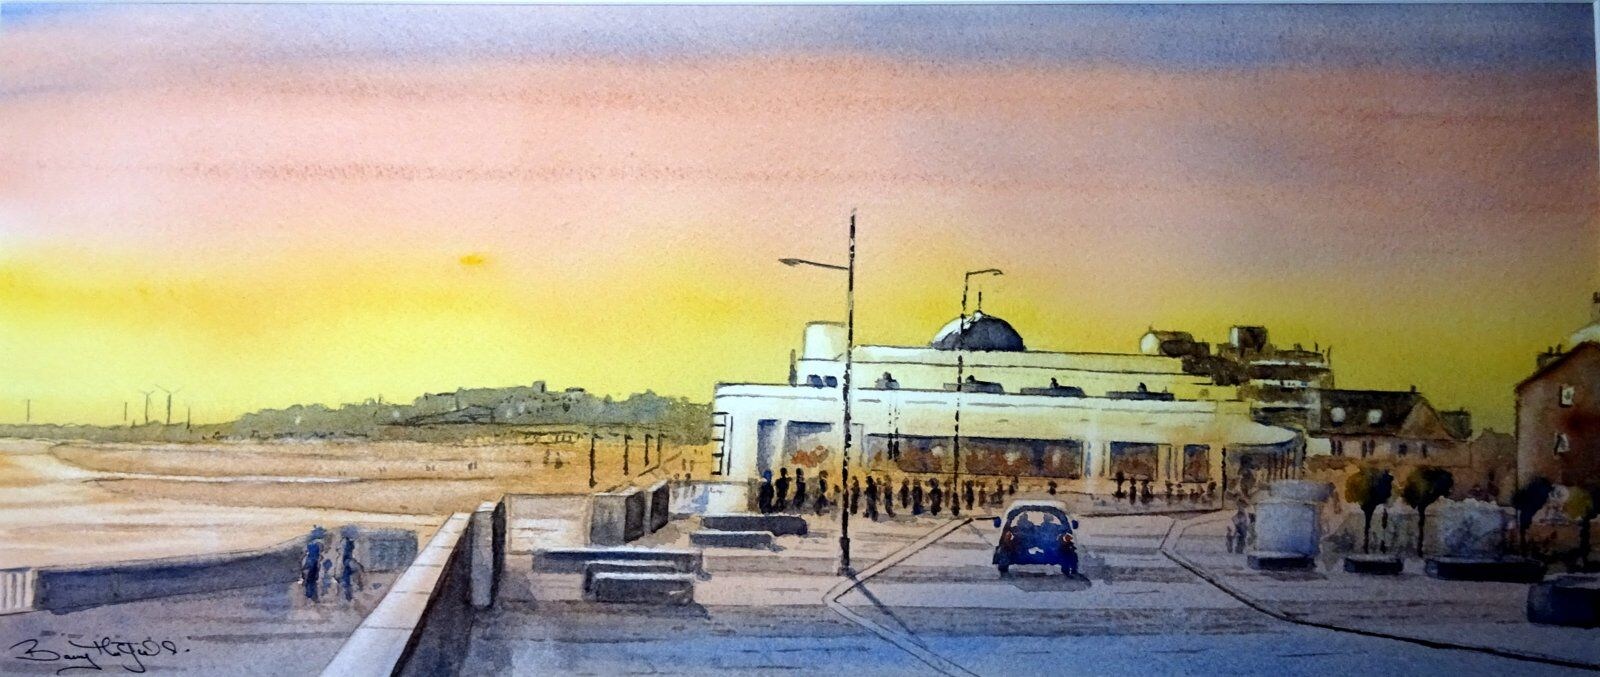 Bridlinton Spa ...Sunset